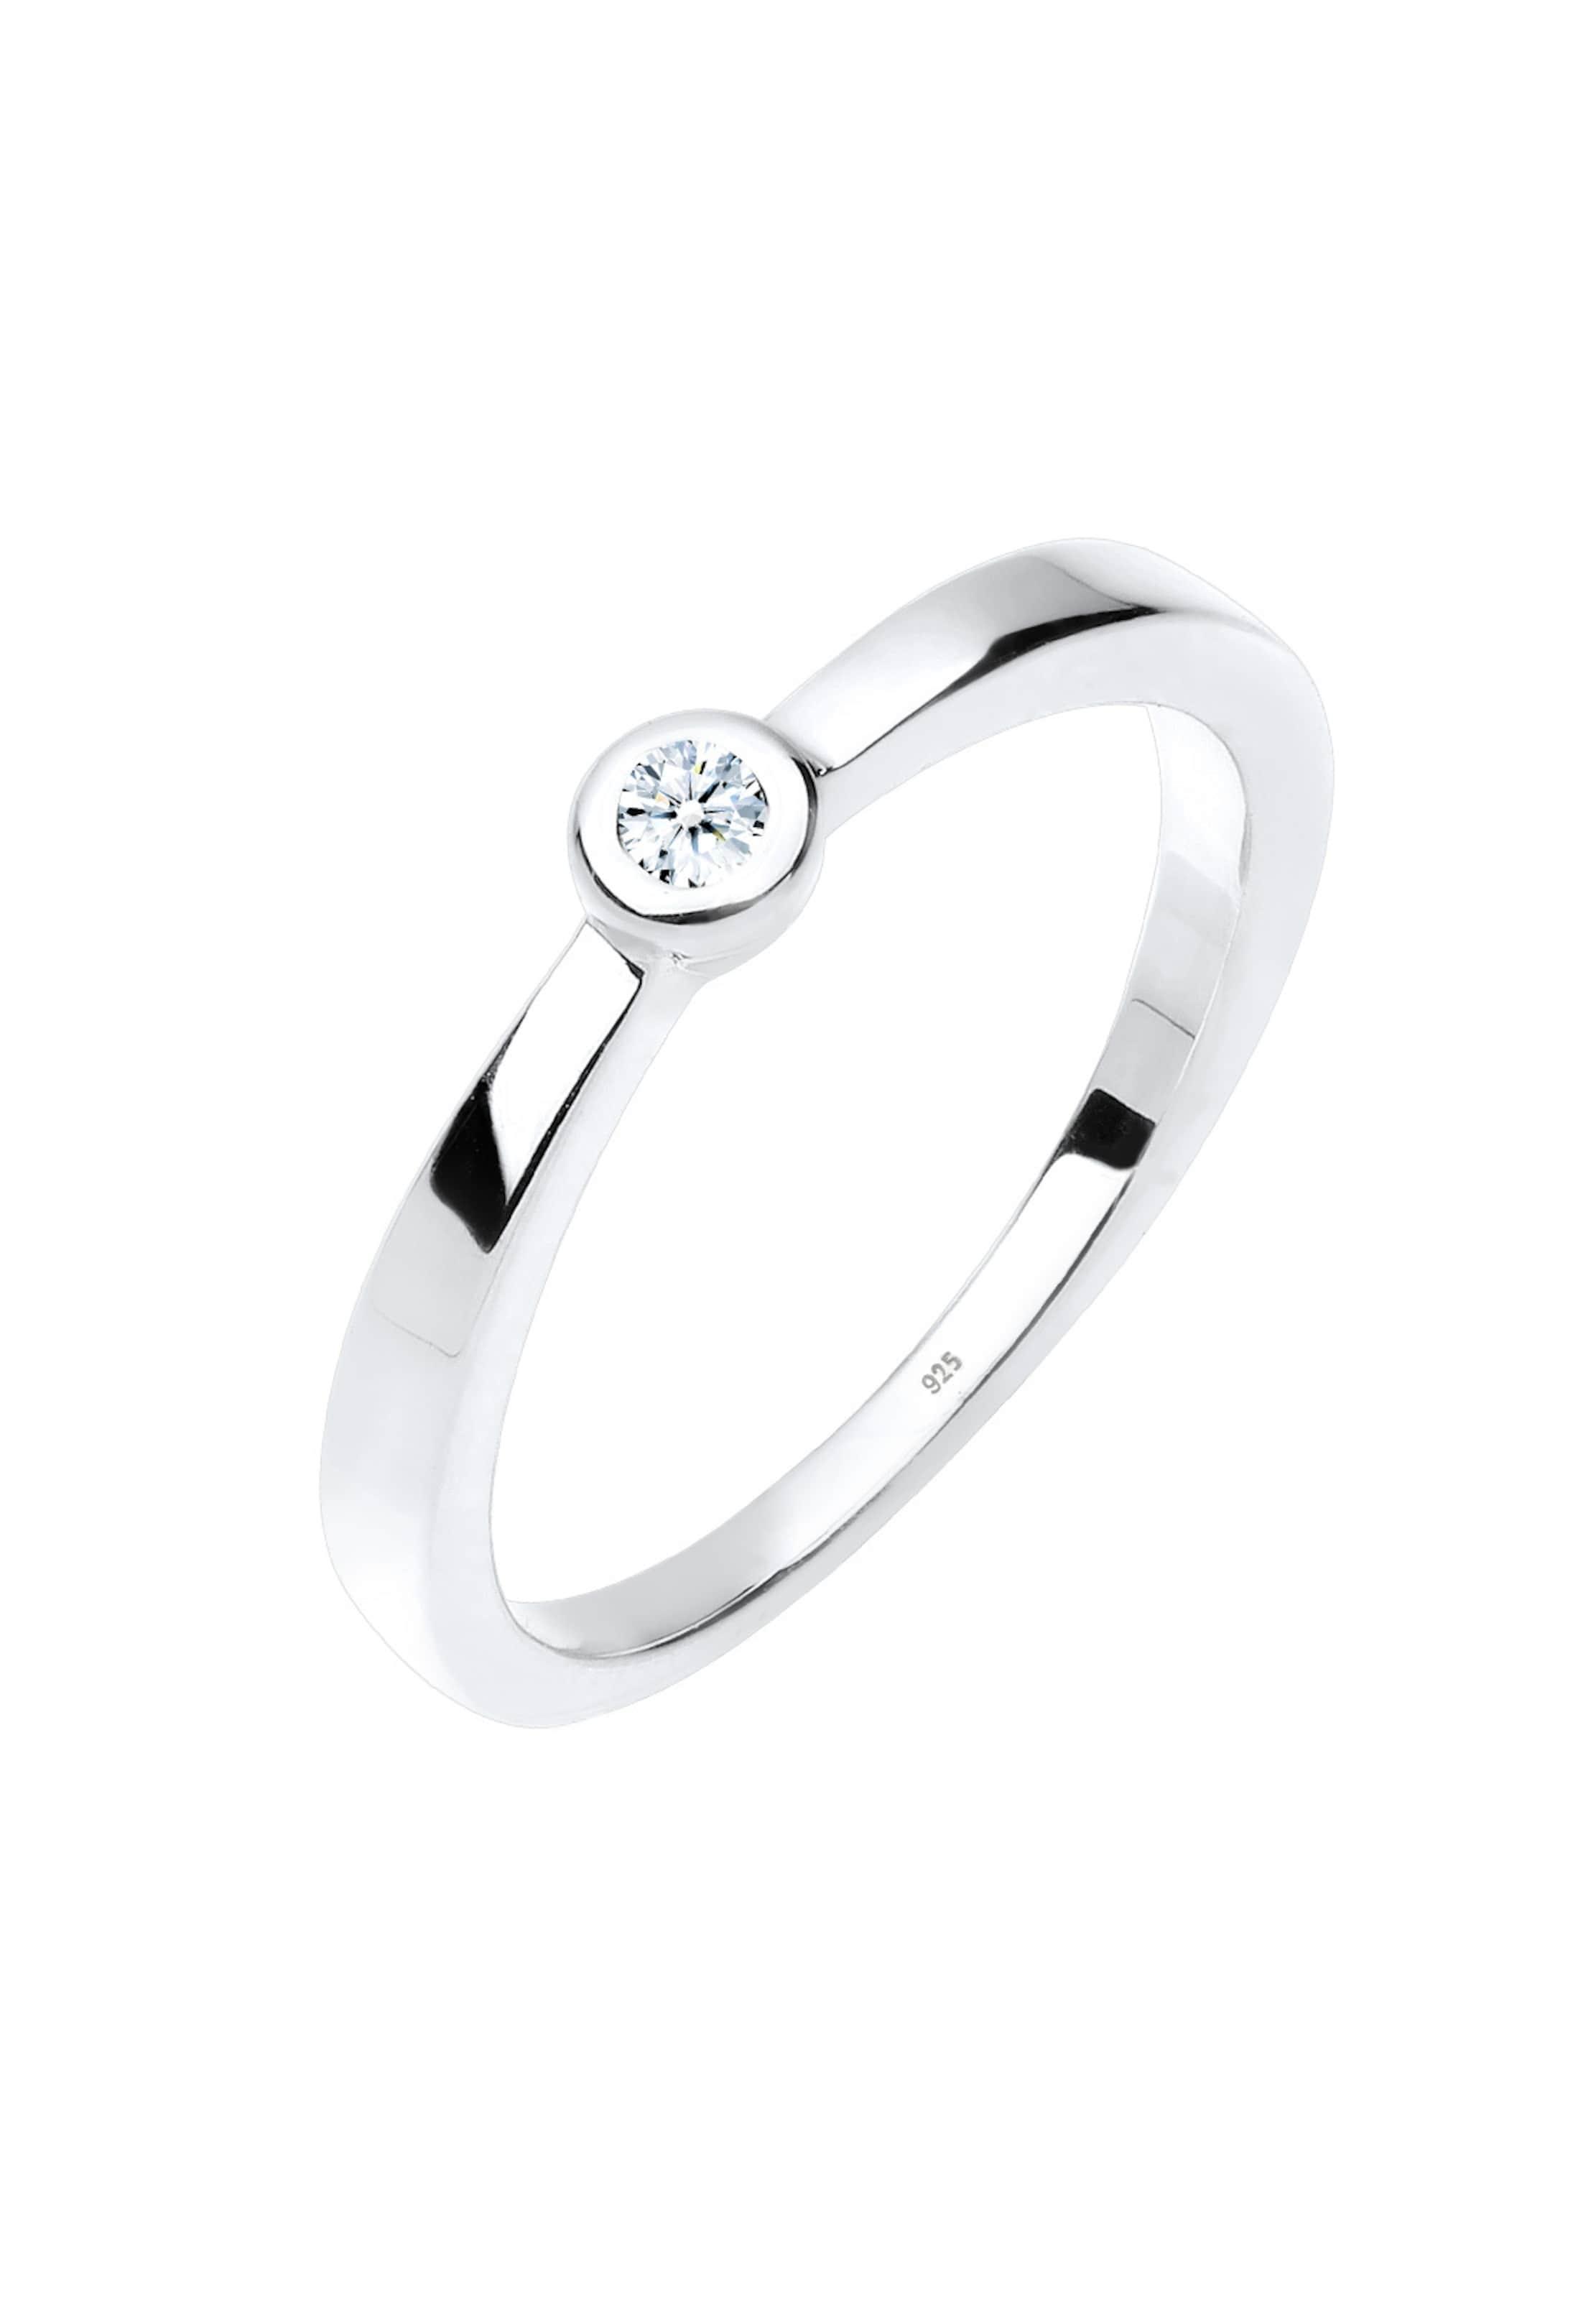 Silber Diamore Ring Diamore Silber Silber In Ring Ring Diamore In In Diamore EdBoerWQCx